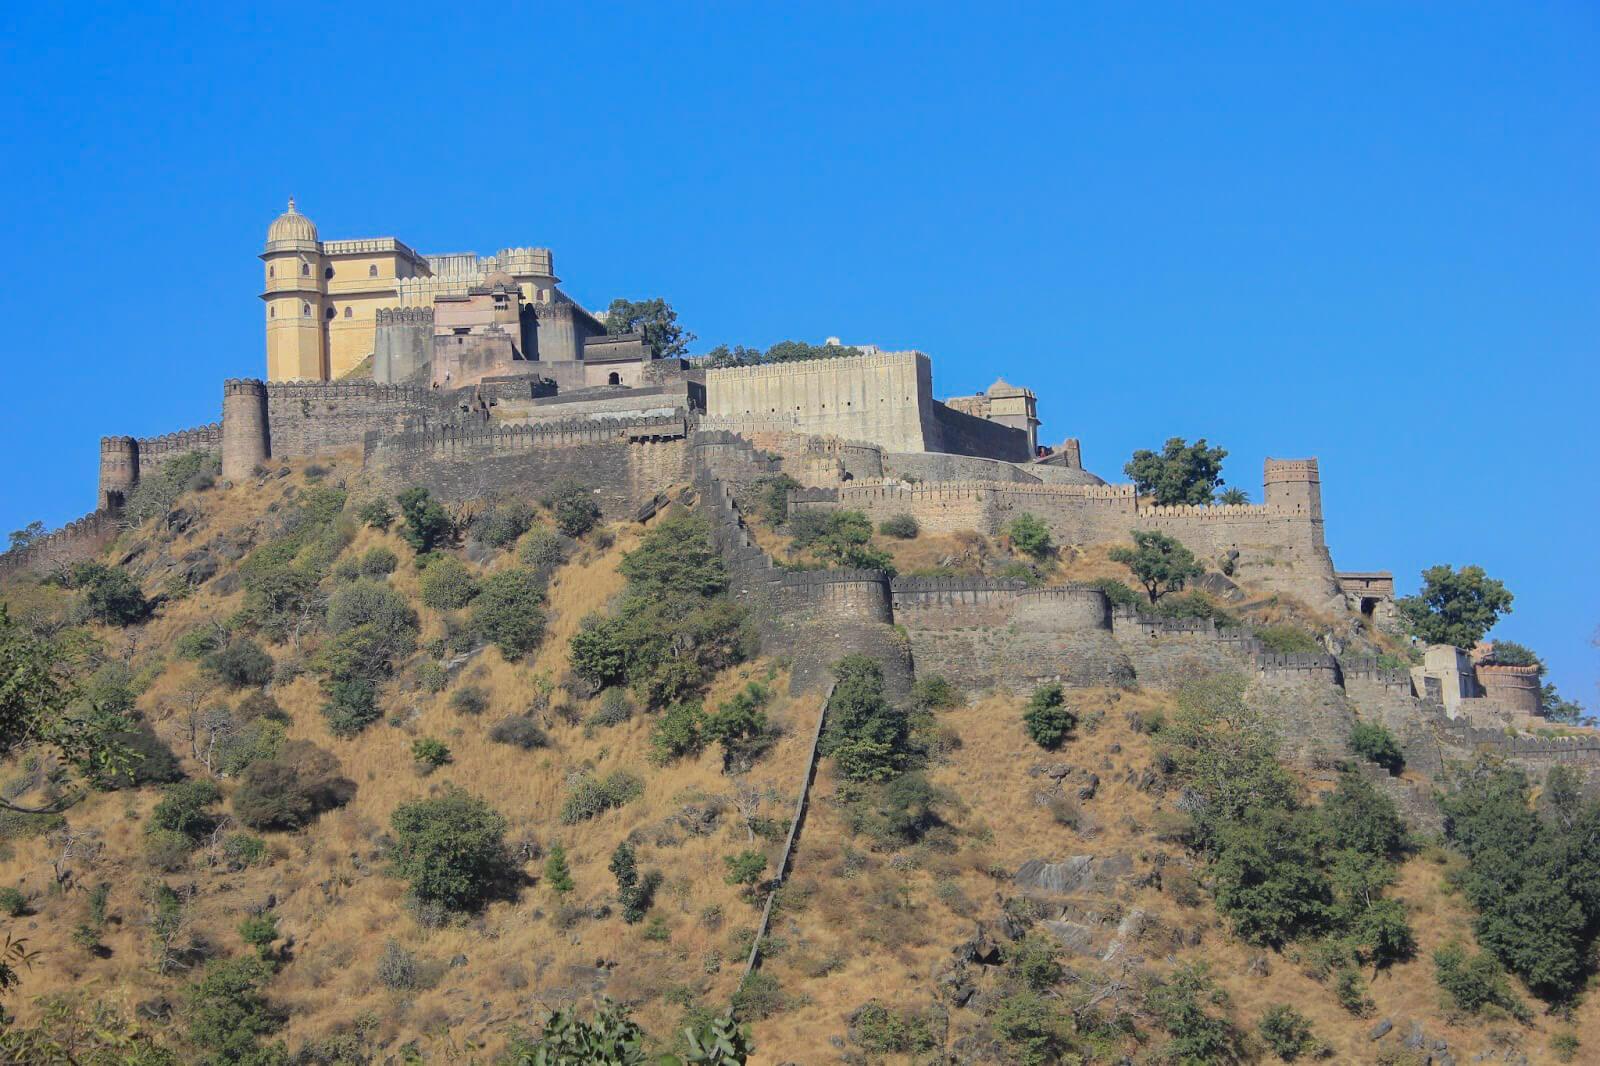 Badal Mahal at Kumbhalgarh Fort, one of the historic destinations of royal Rajasthan